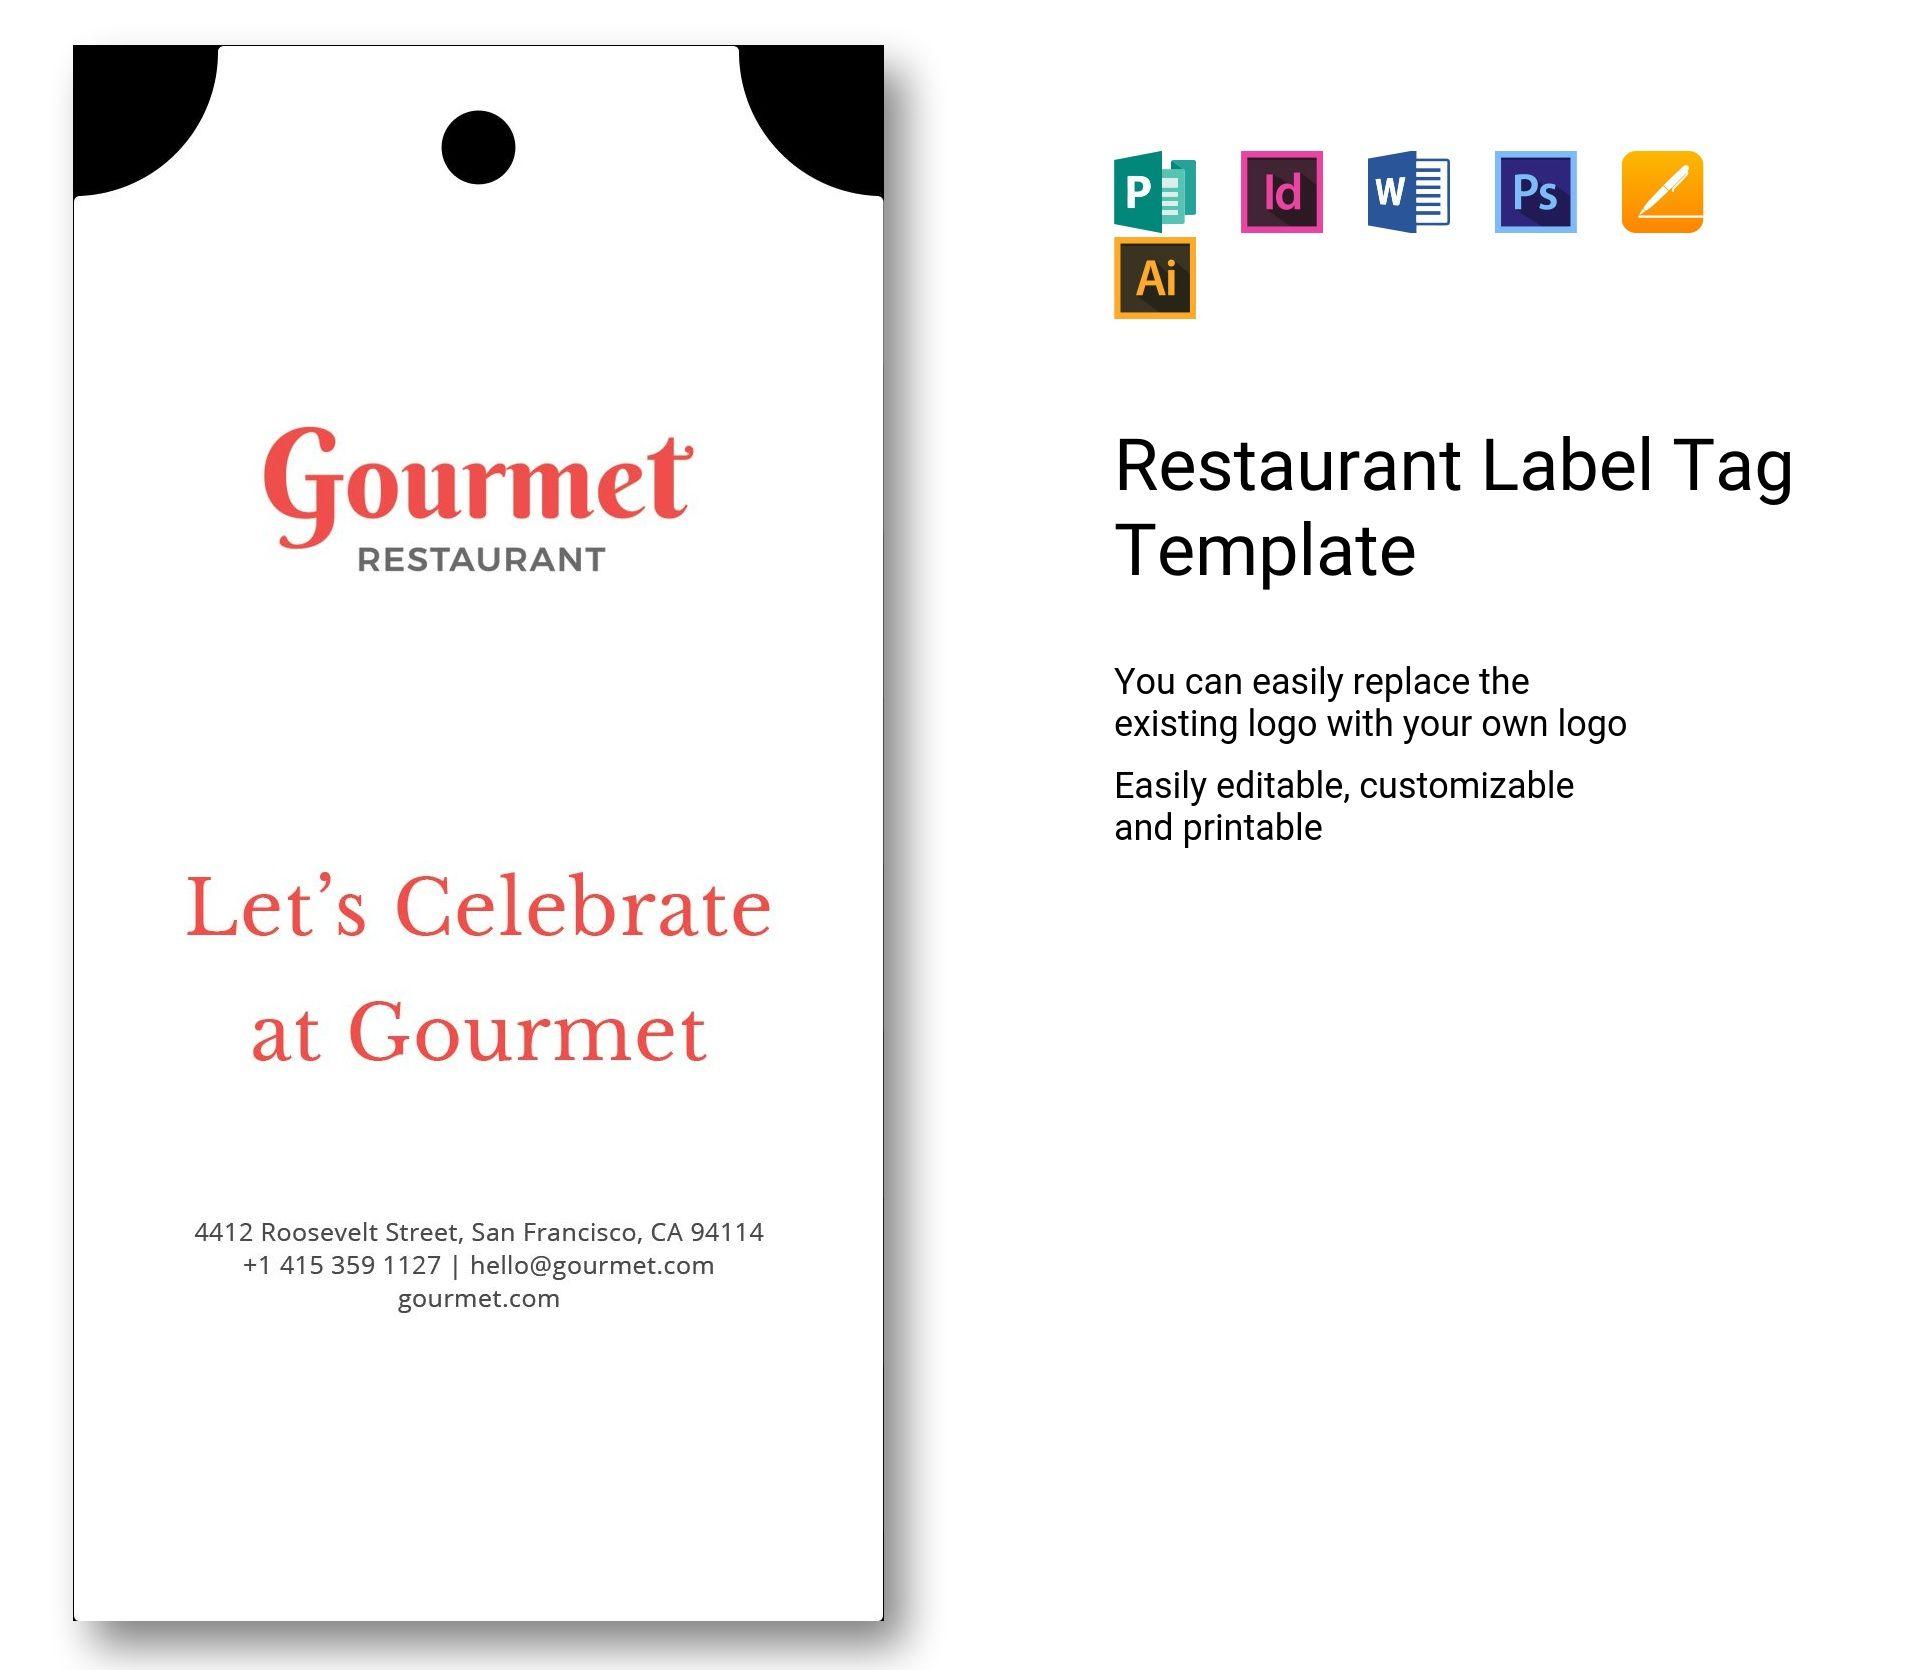 Restaurant Label Tag